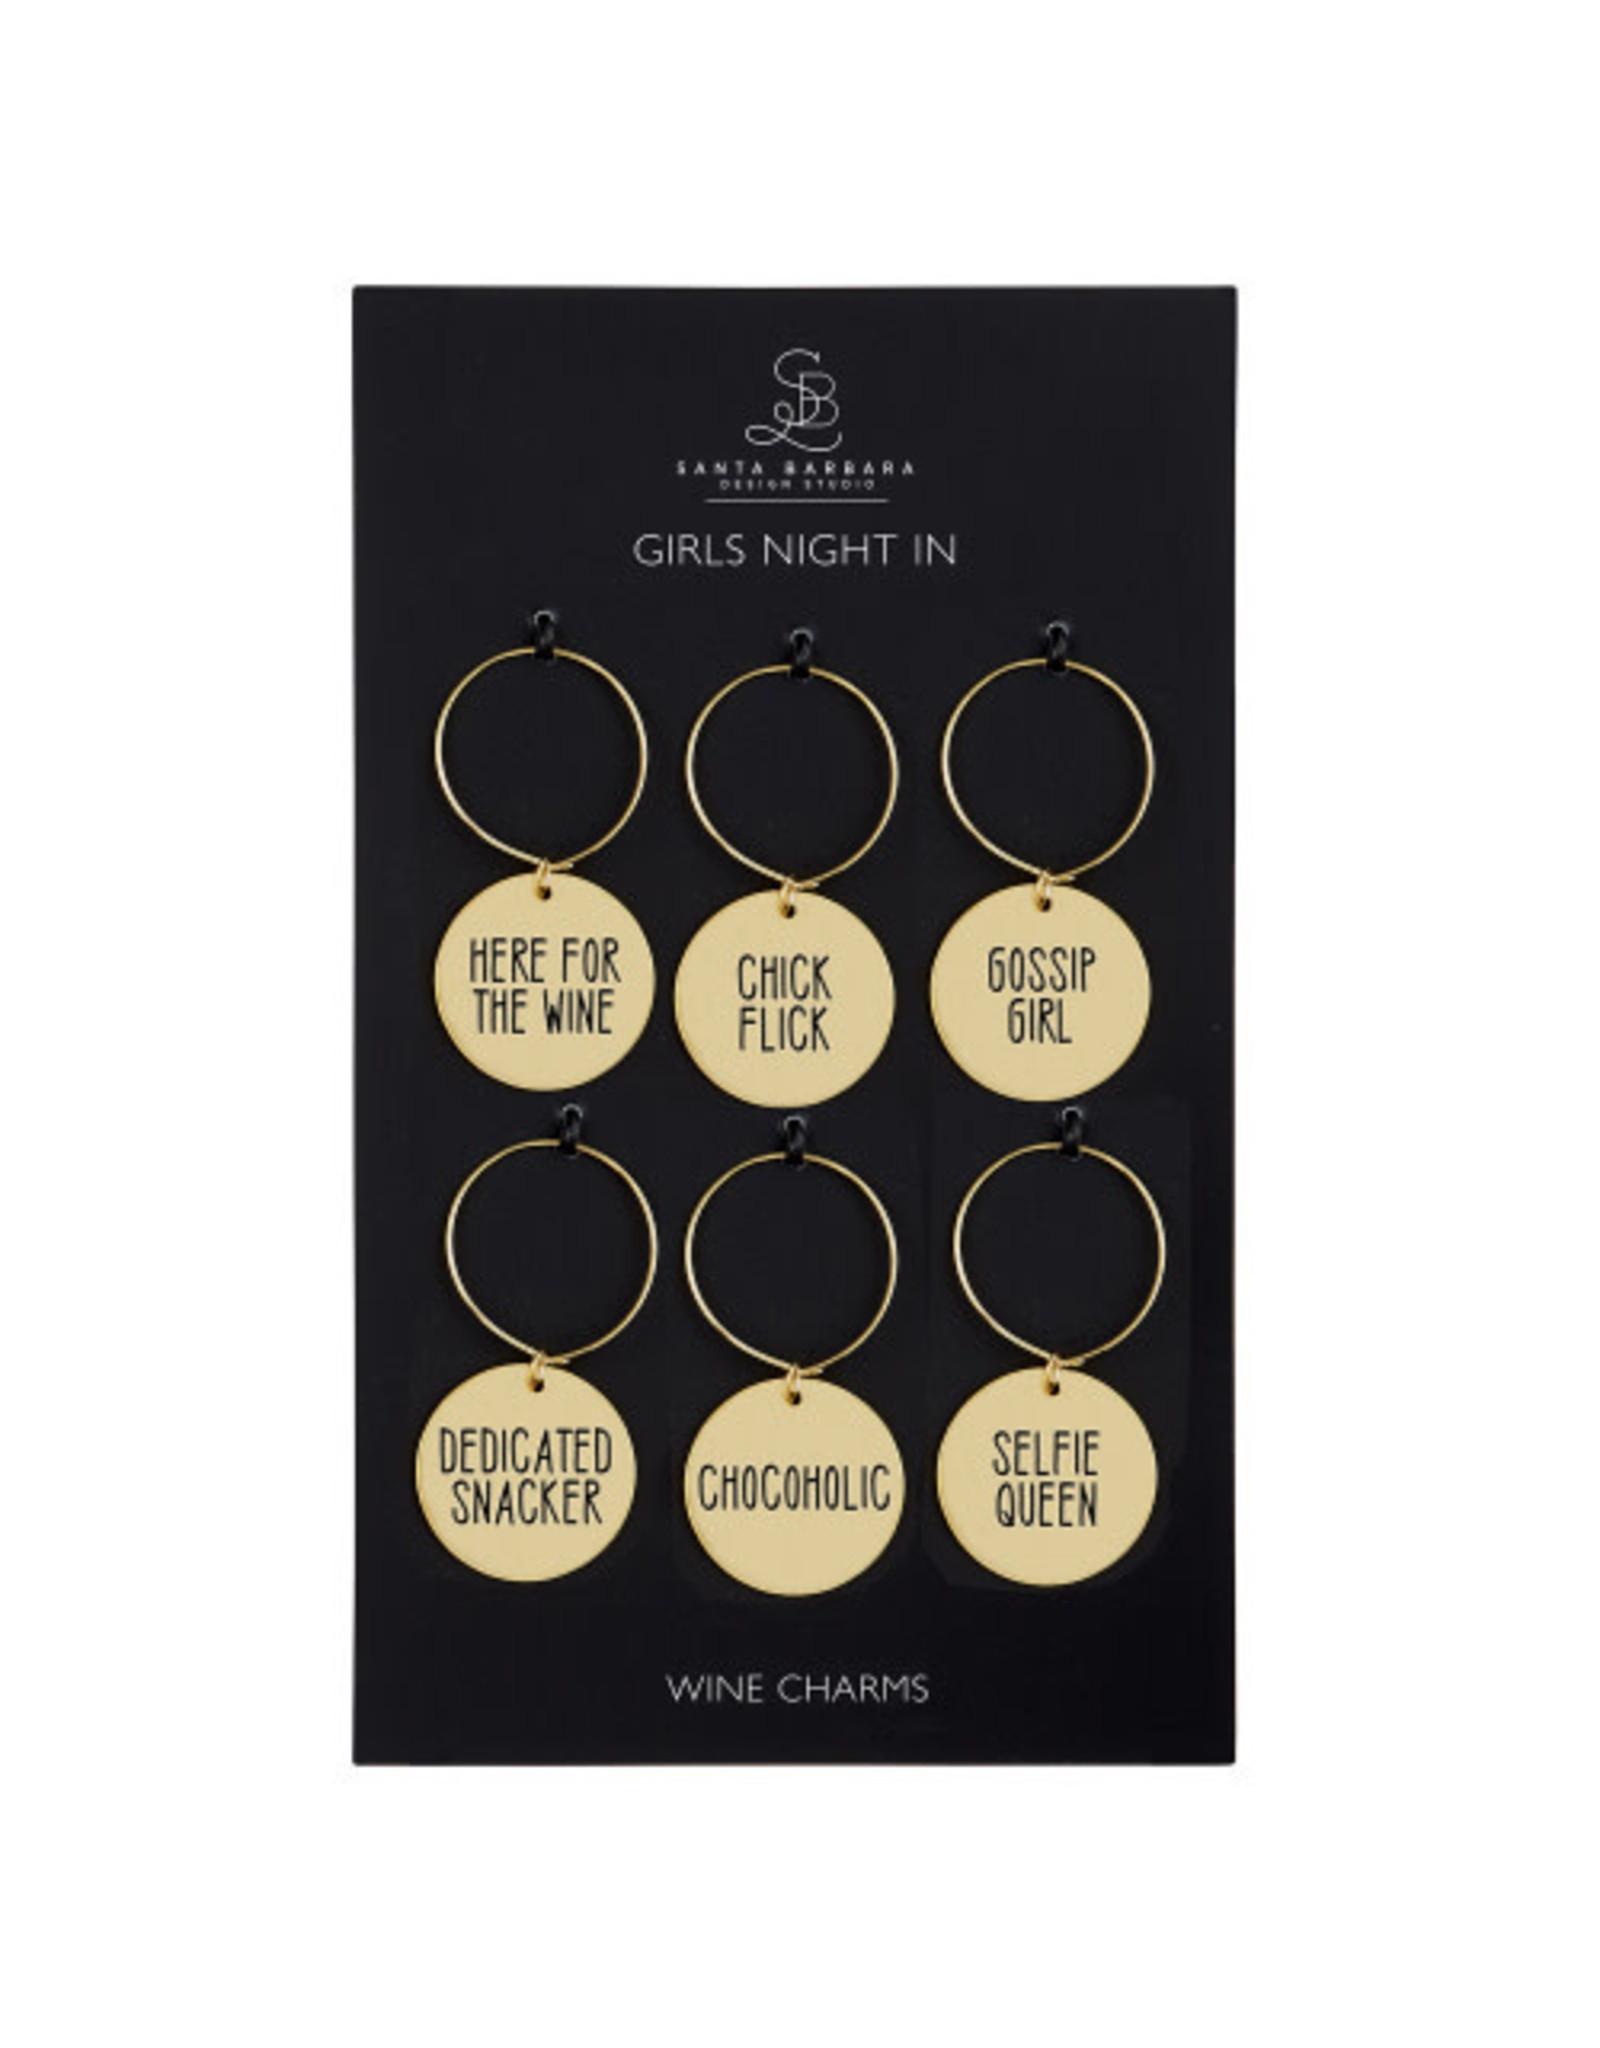 Creative Brands Wine Charm Set, Girls Night In